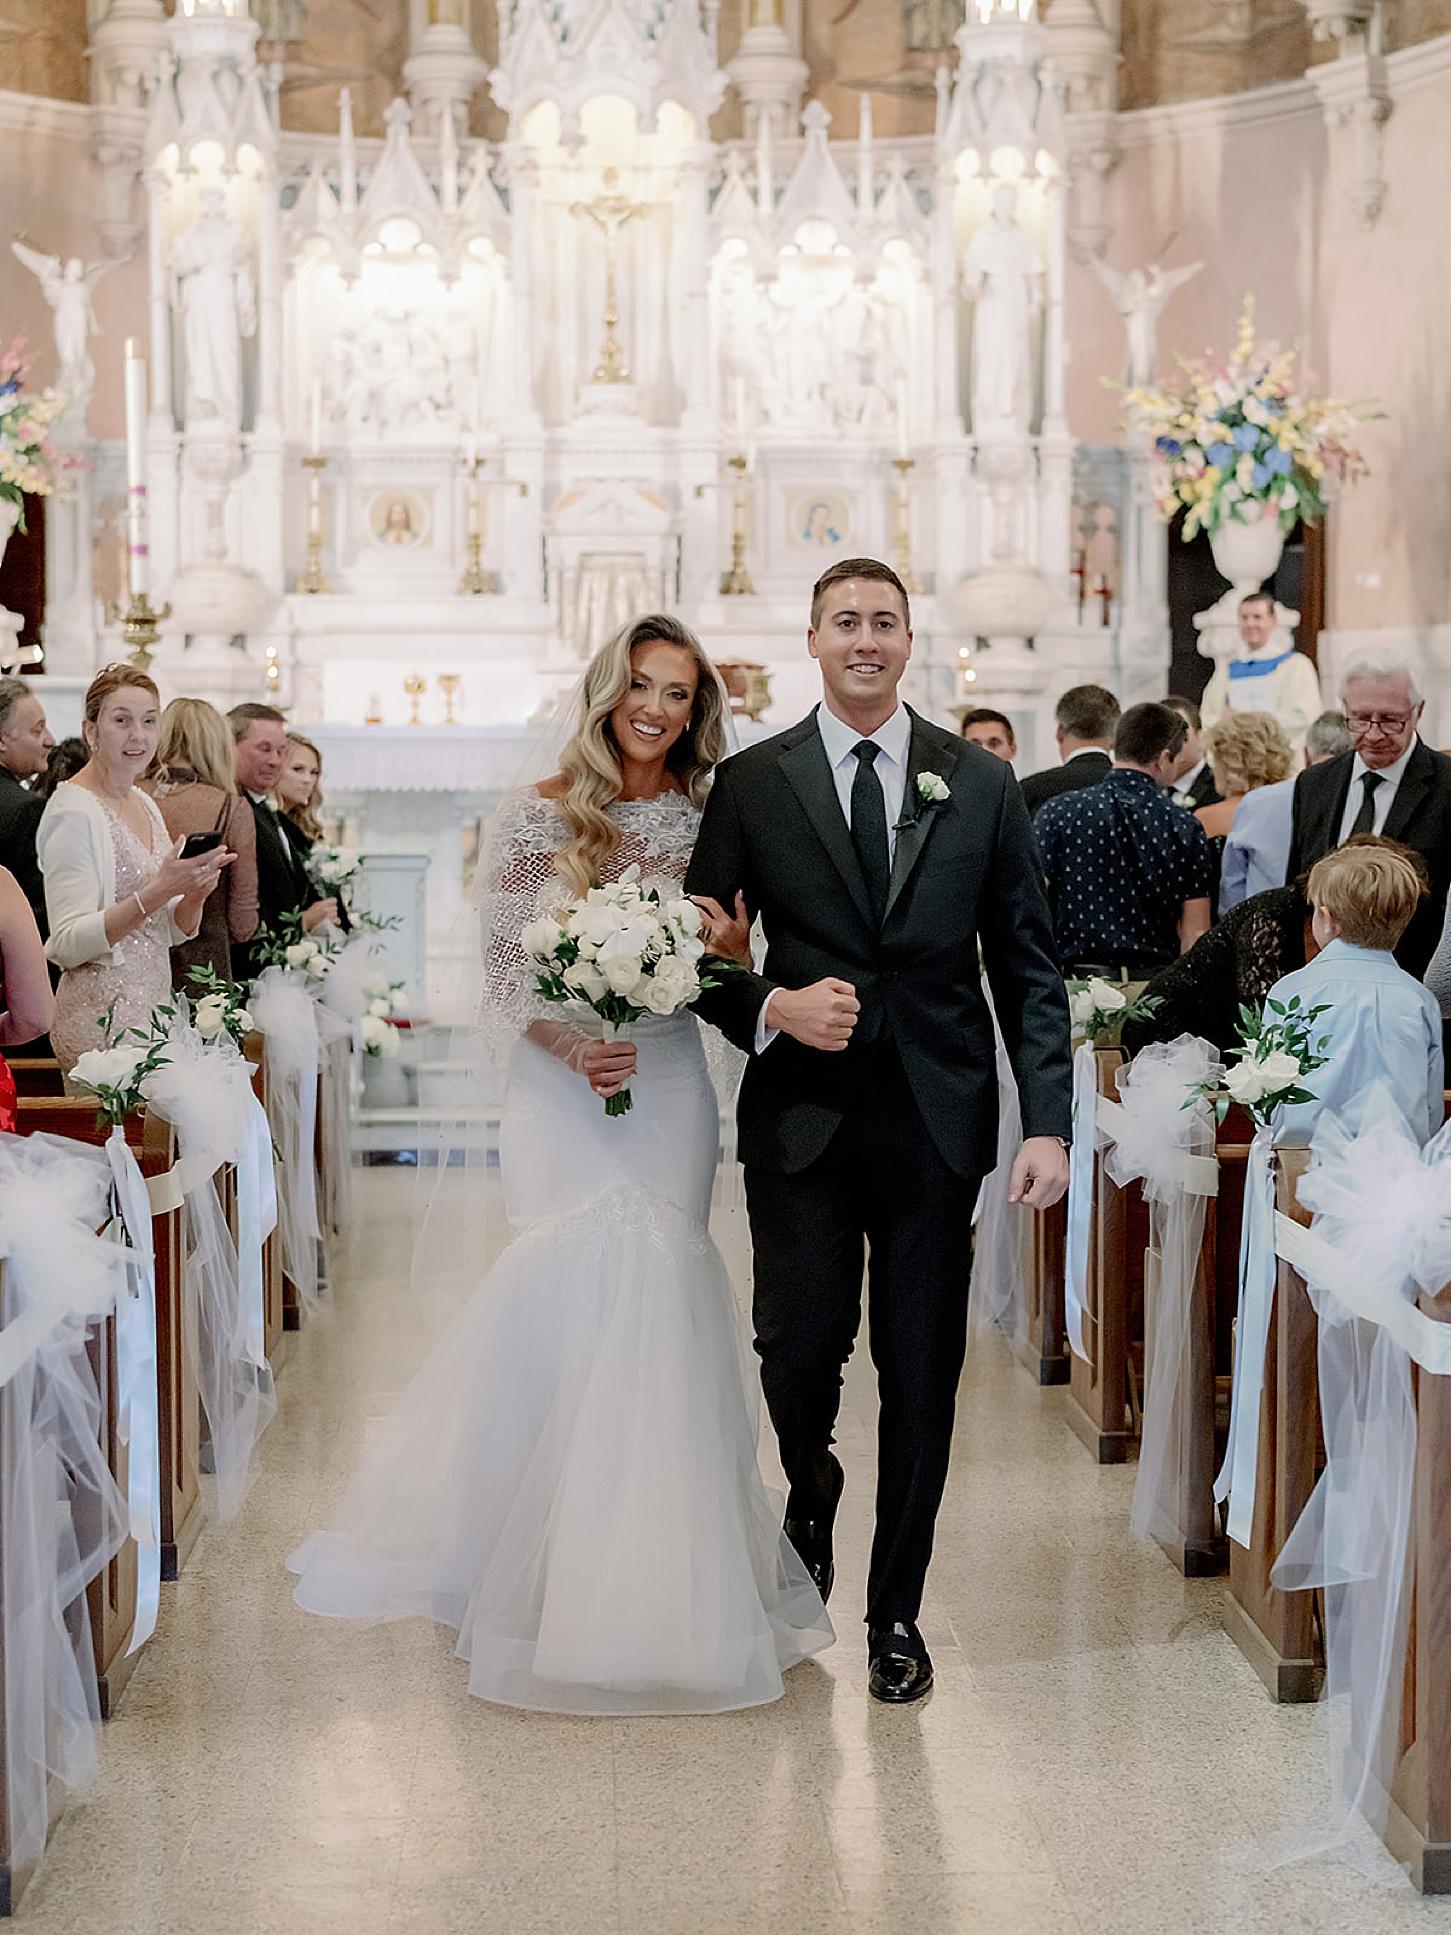 Atlantic City Wedding Photography Studio by Magdalena Studios Lexy Cha 0026